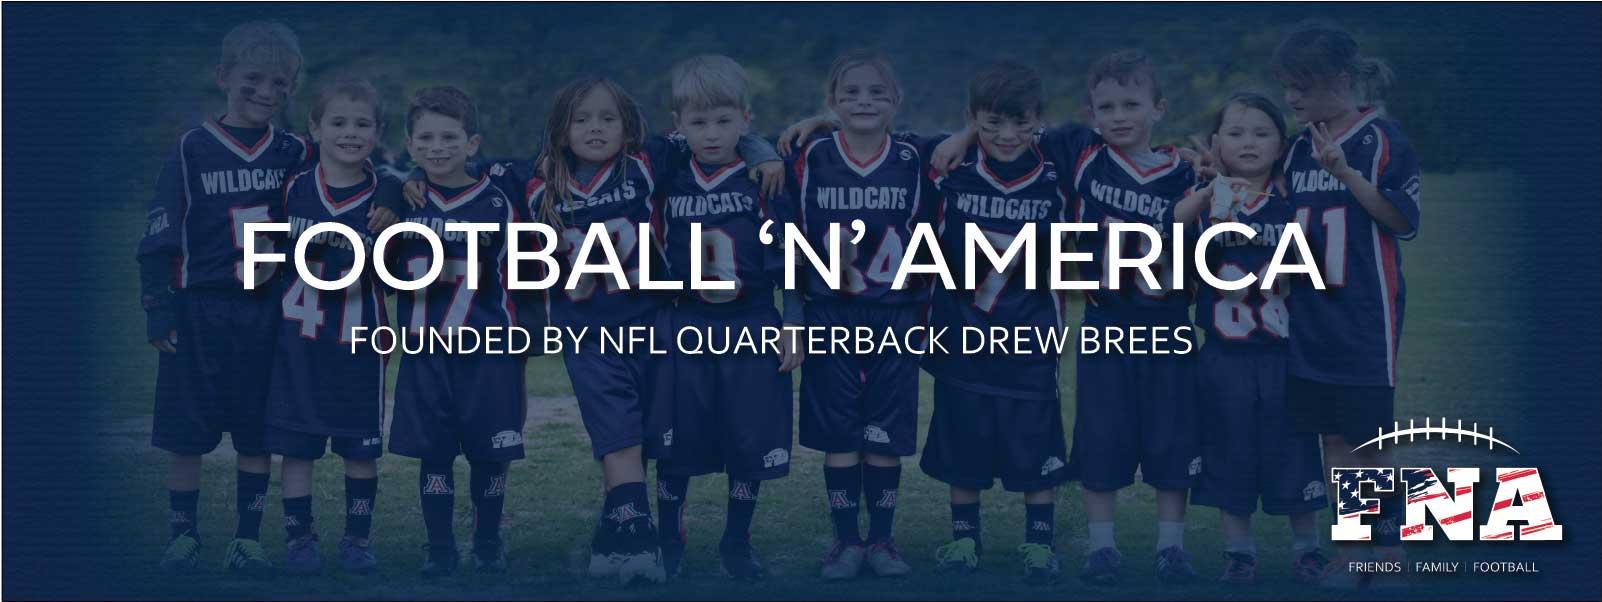 FOOTBALL 'N' AMERICA